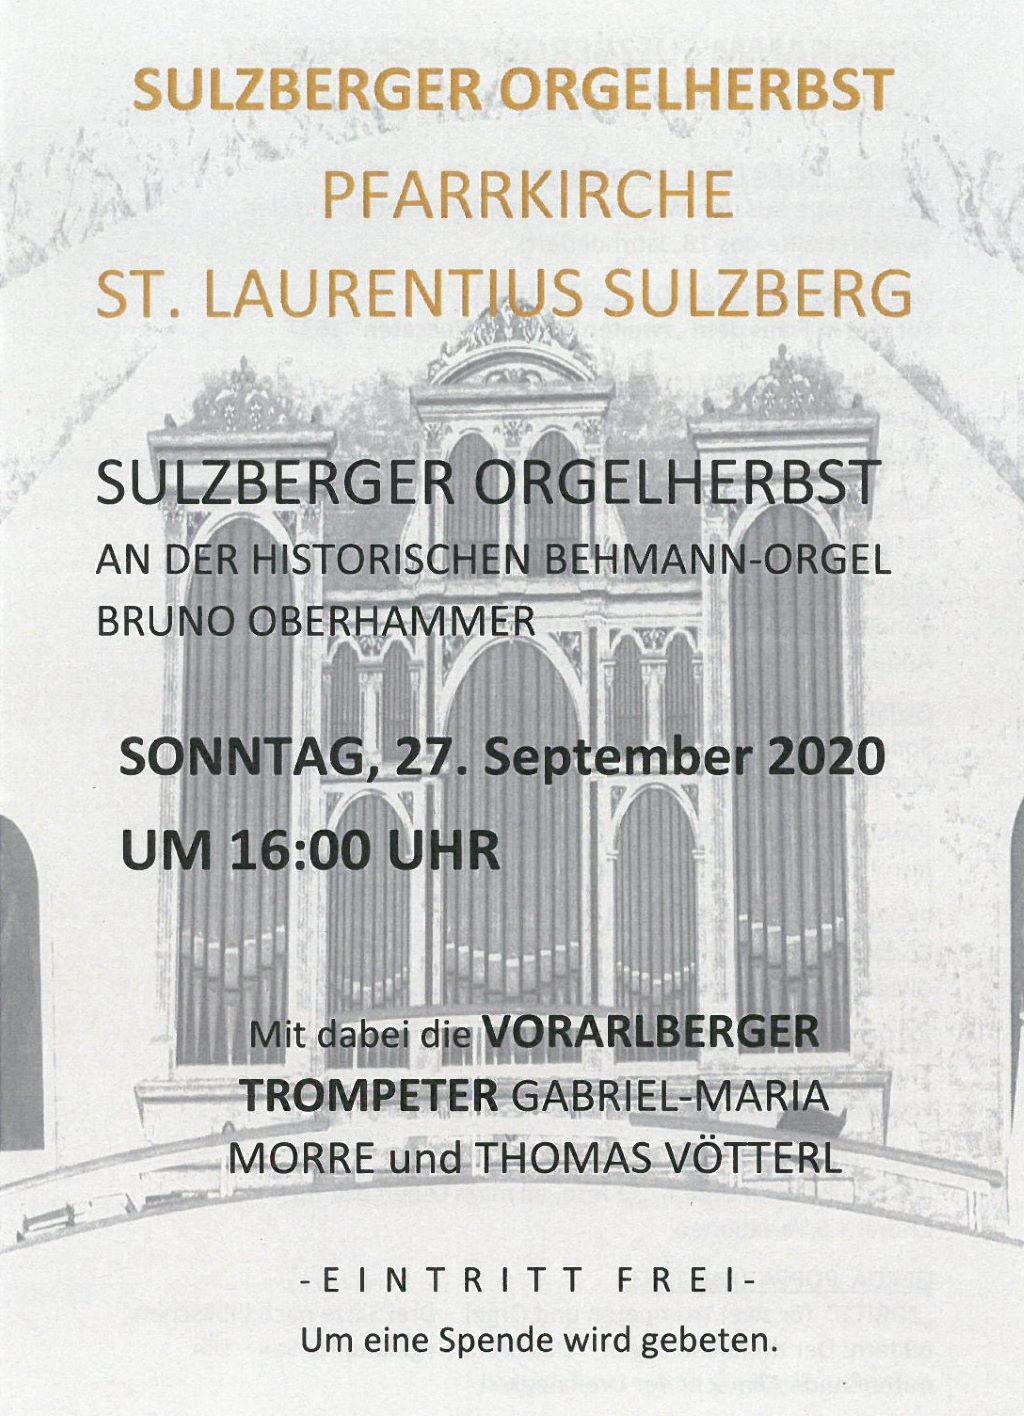 Sulzberger Orgelherbst